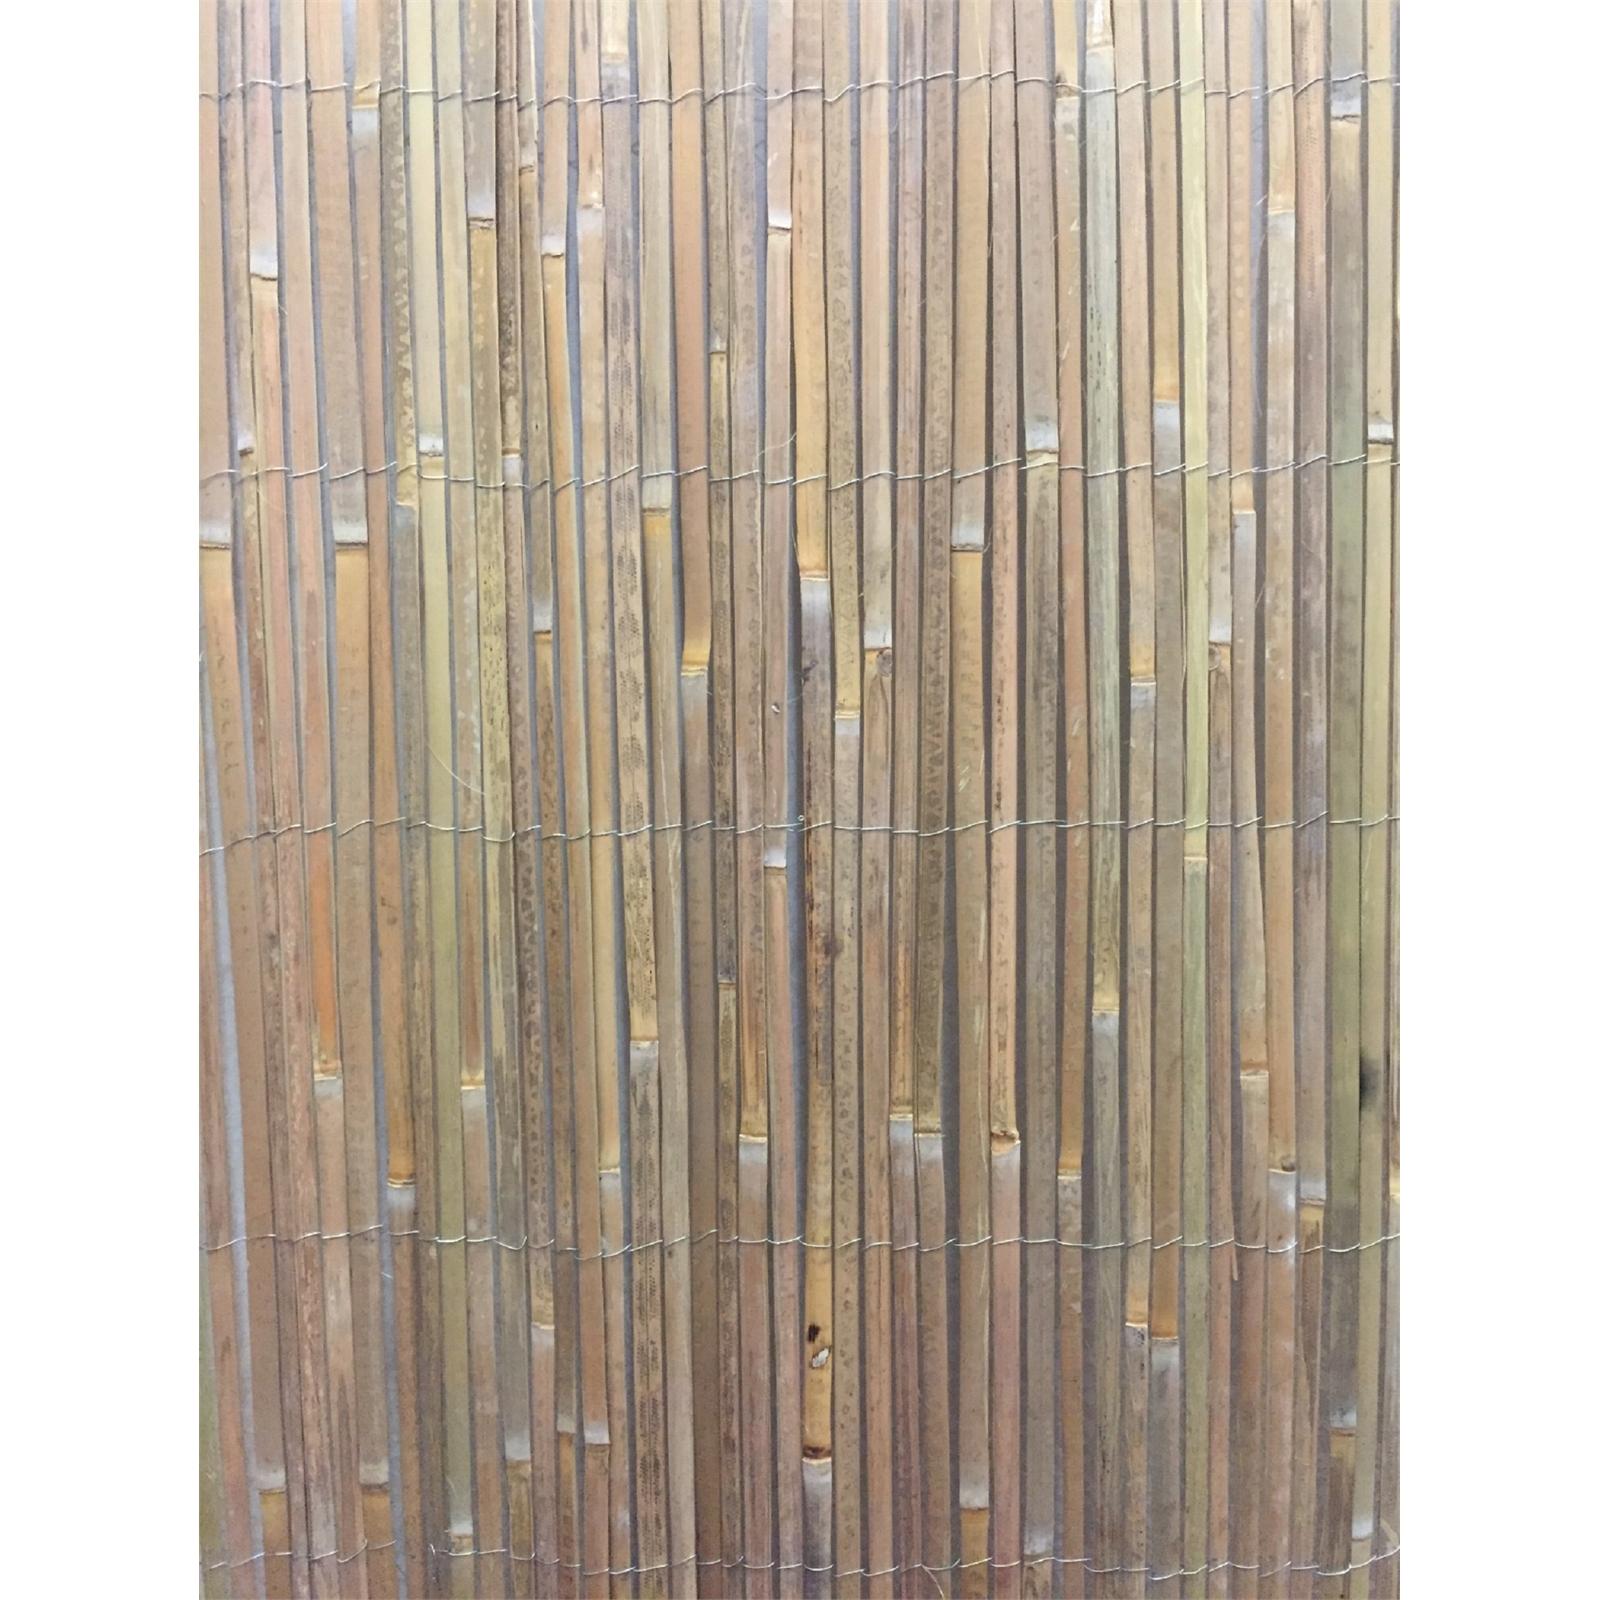 EDEN 1.8 x 3m Bamboo Slat Screen Fencing